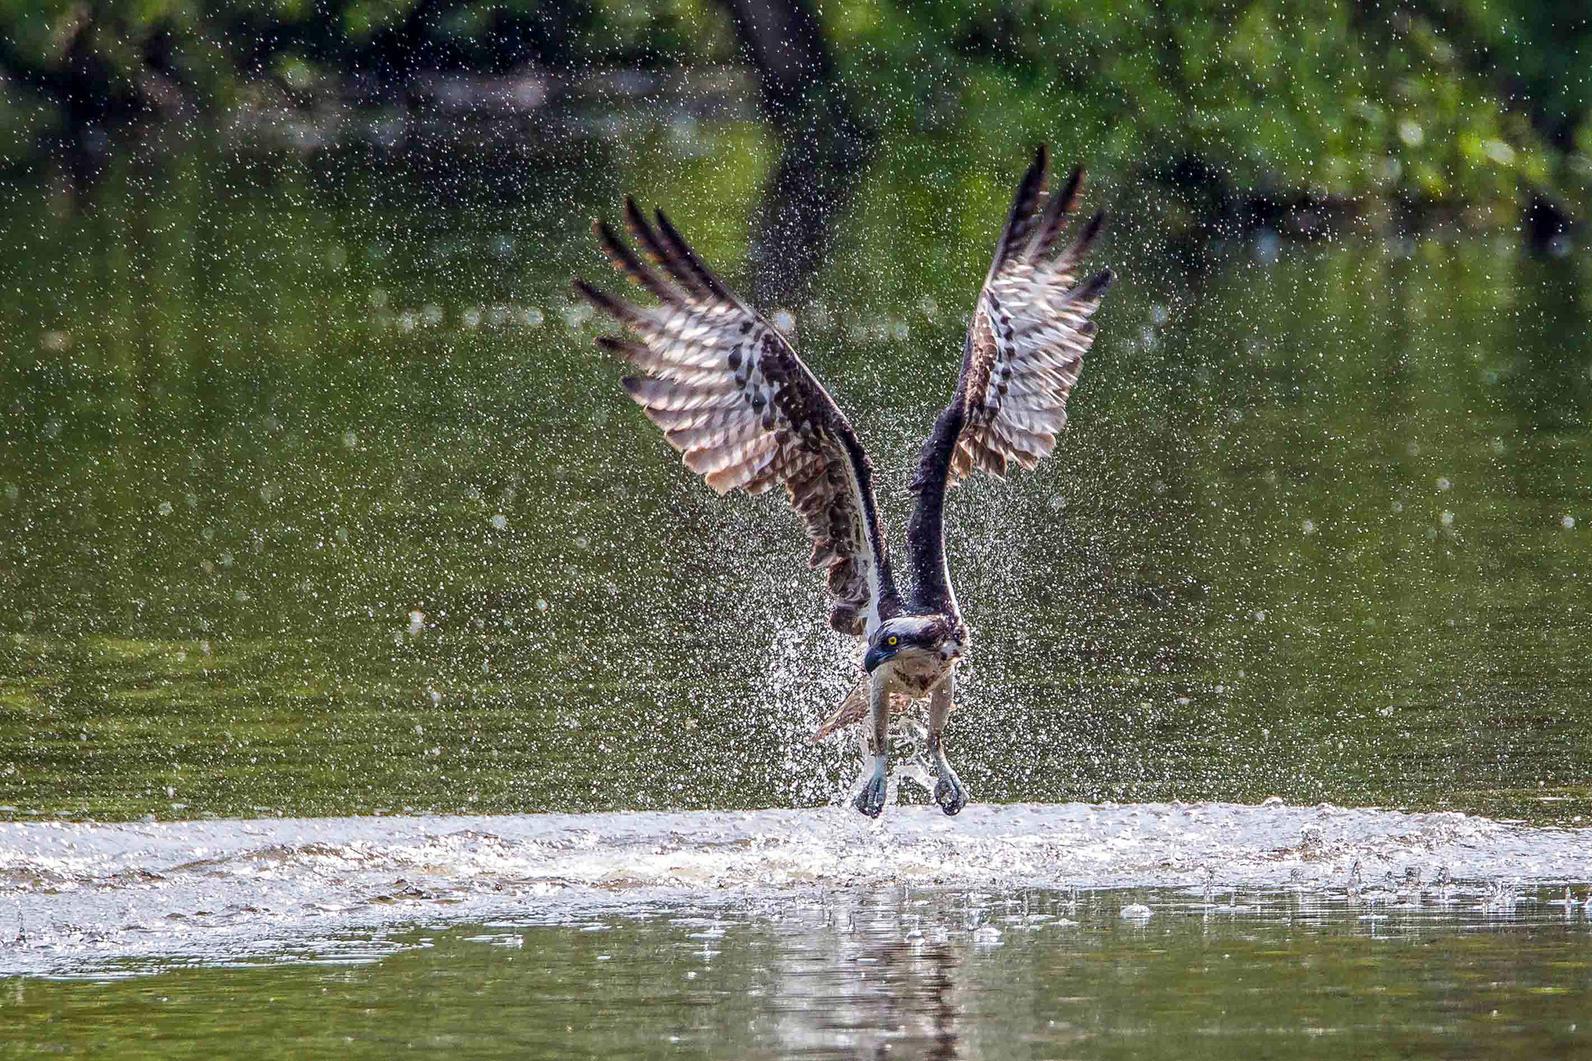 Osprey. Photo: Kurt Wecker/Audubon Photography Awards